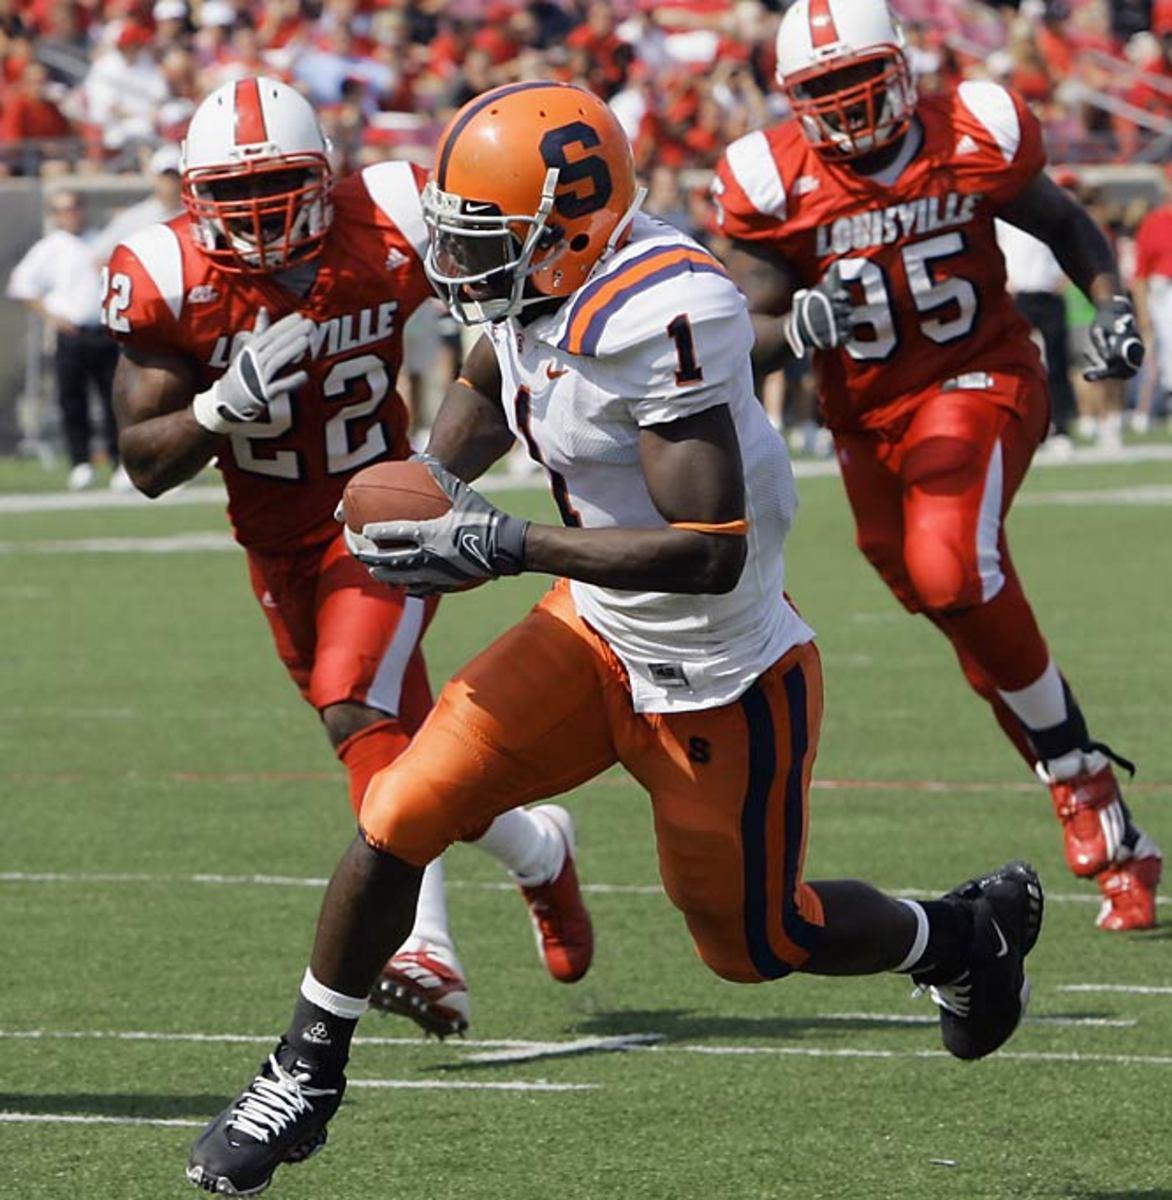 Syracuse 38, No. 18 Louisville 35